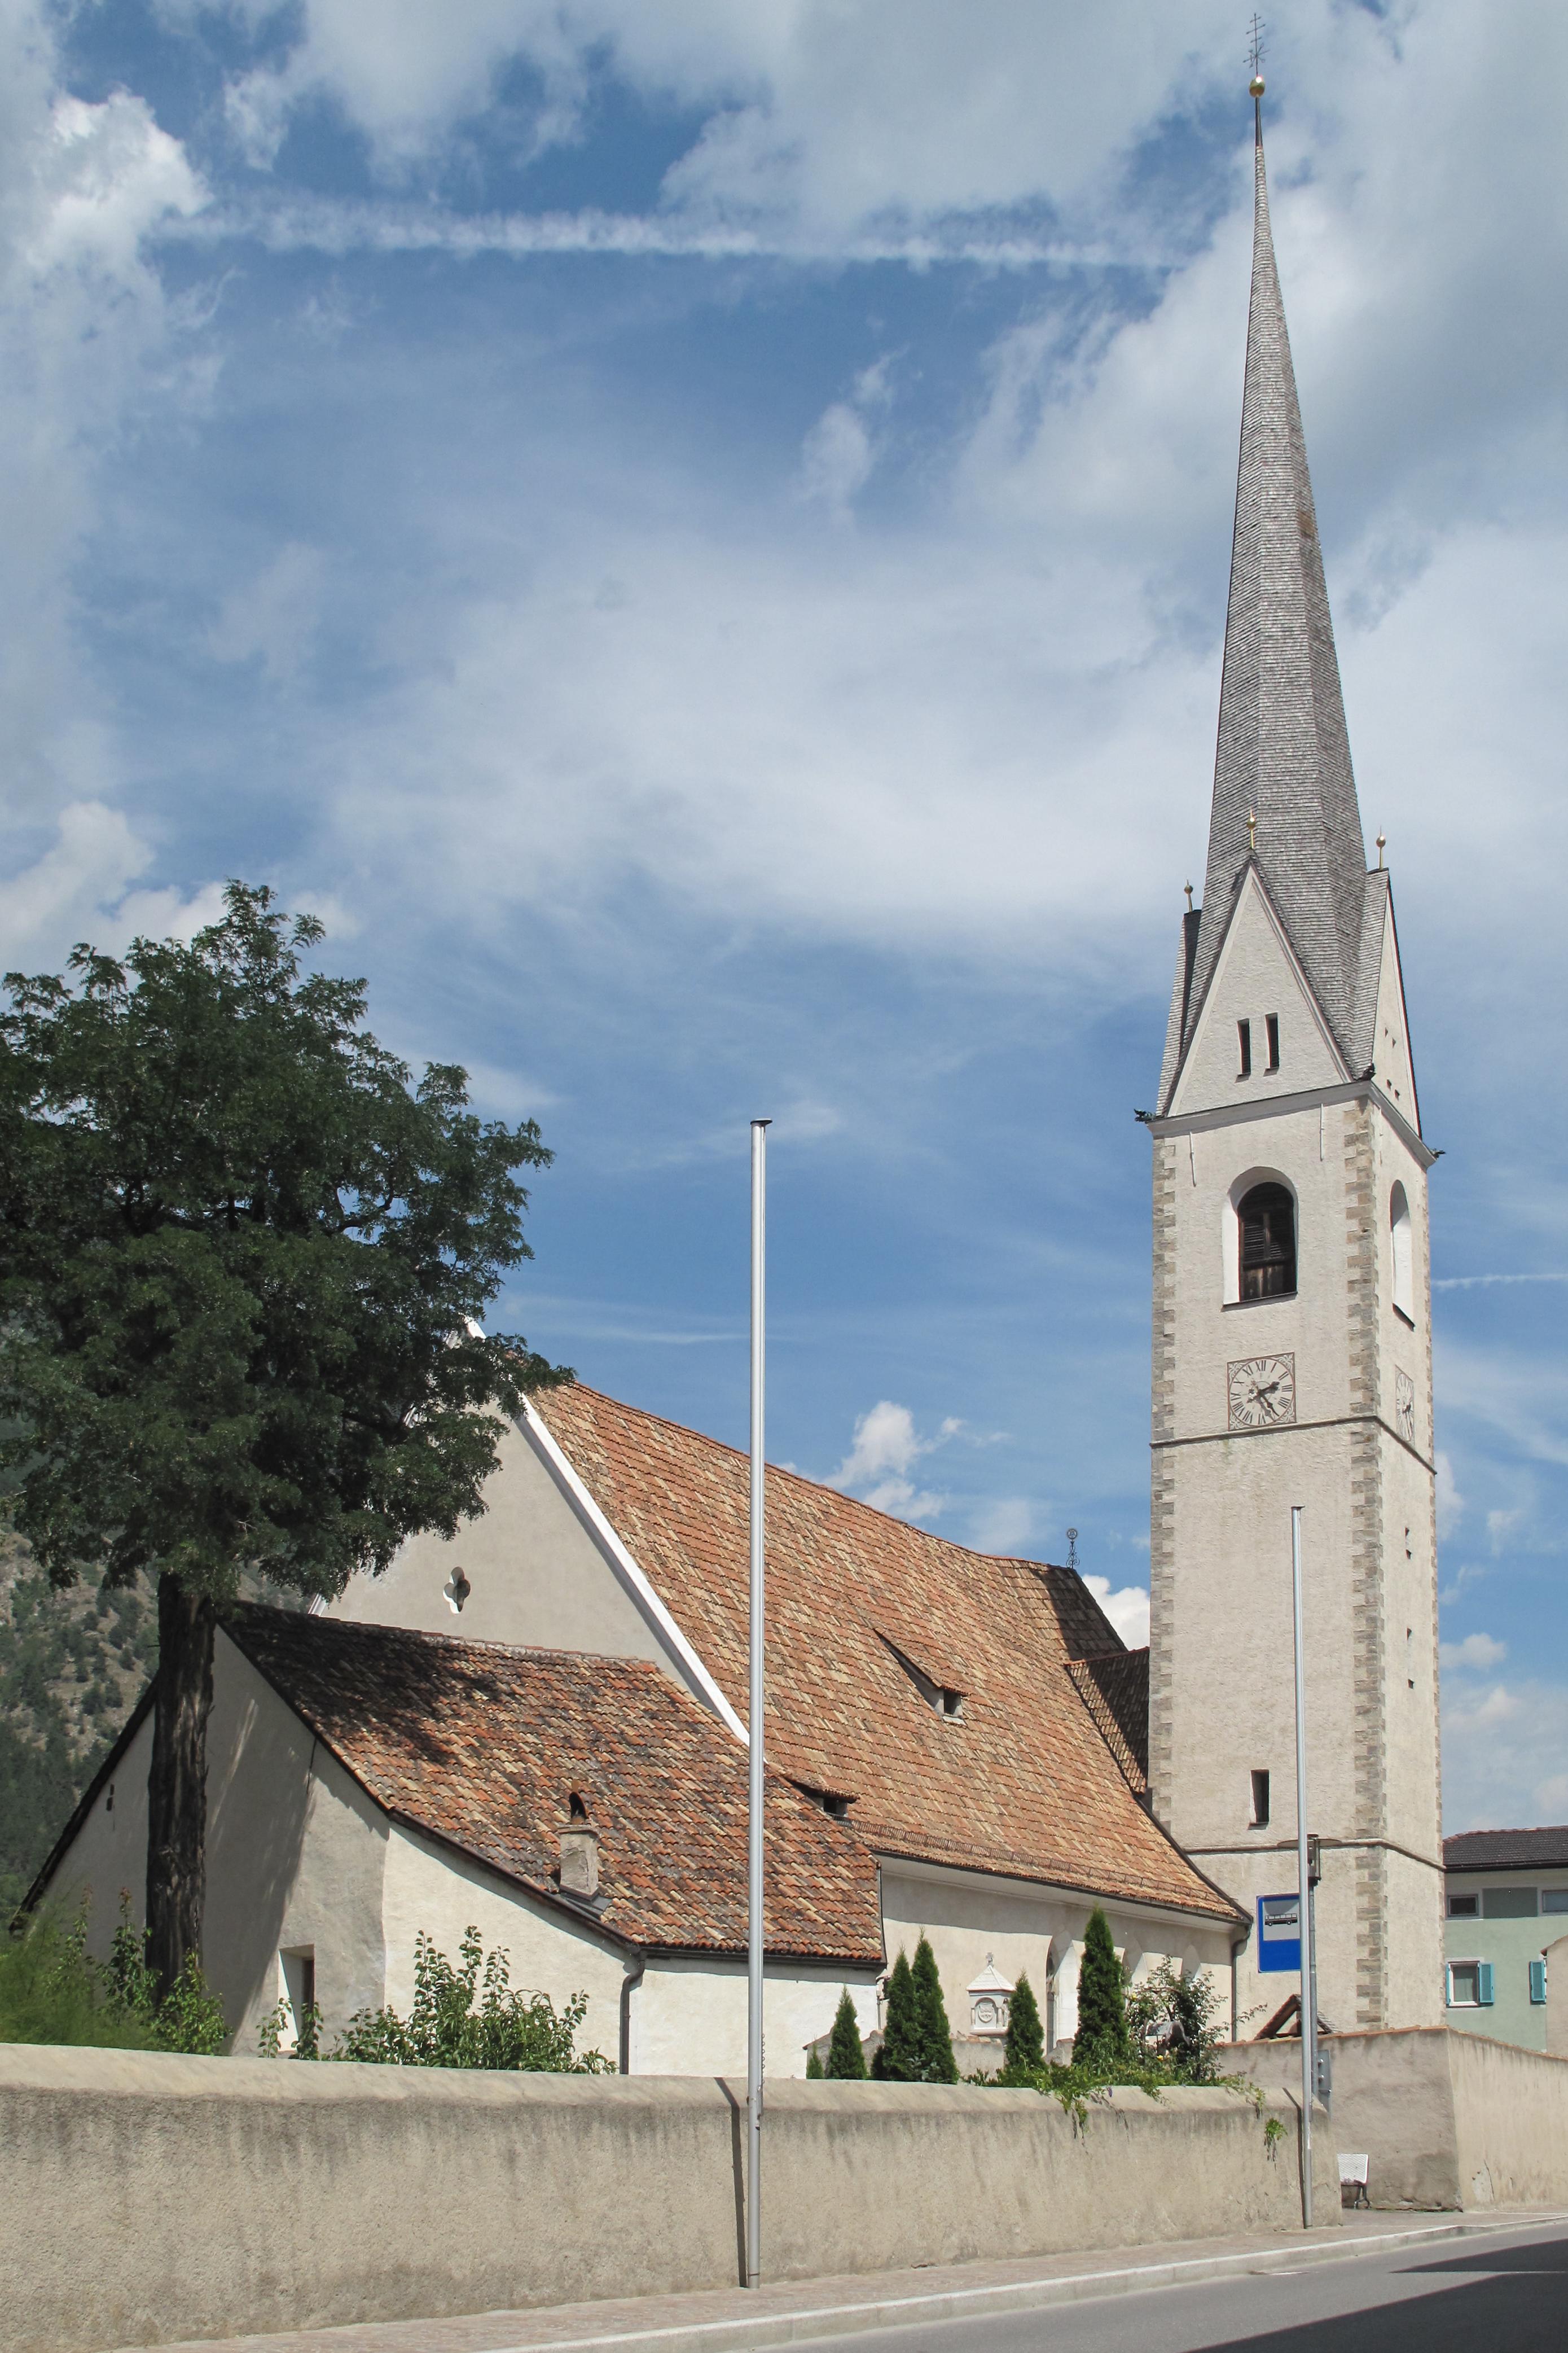 latsch, pfarrkirche st. peter und paul dm15654 foto2 2012-08-12 14.24.jpg